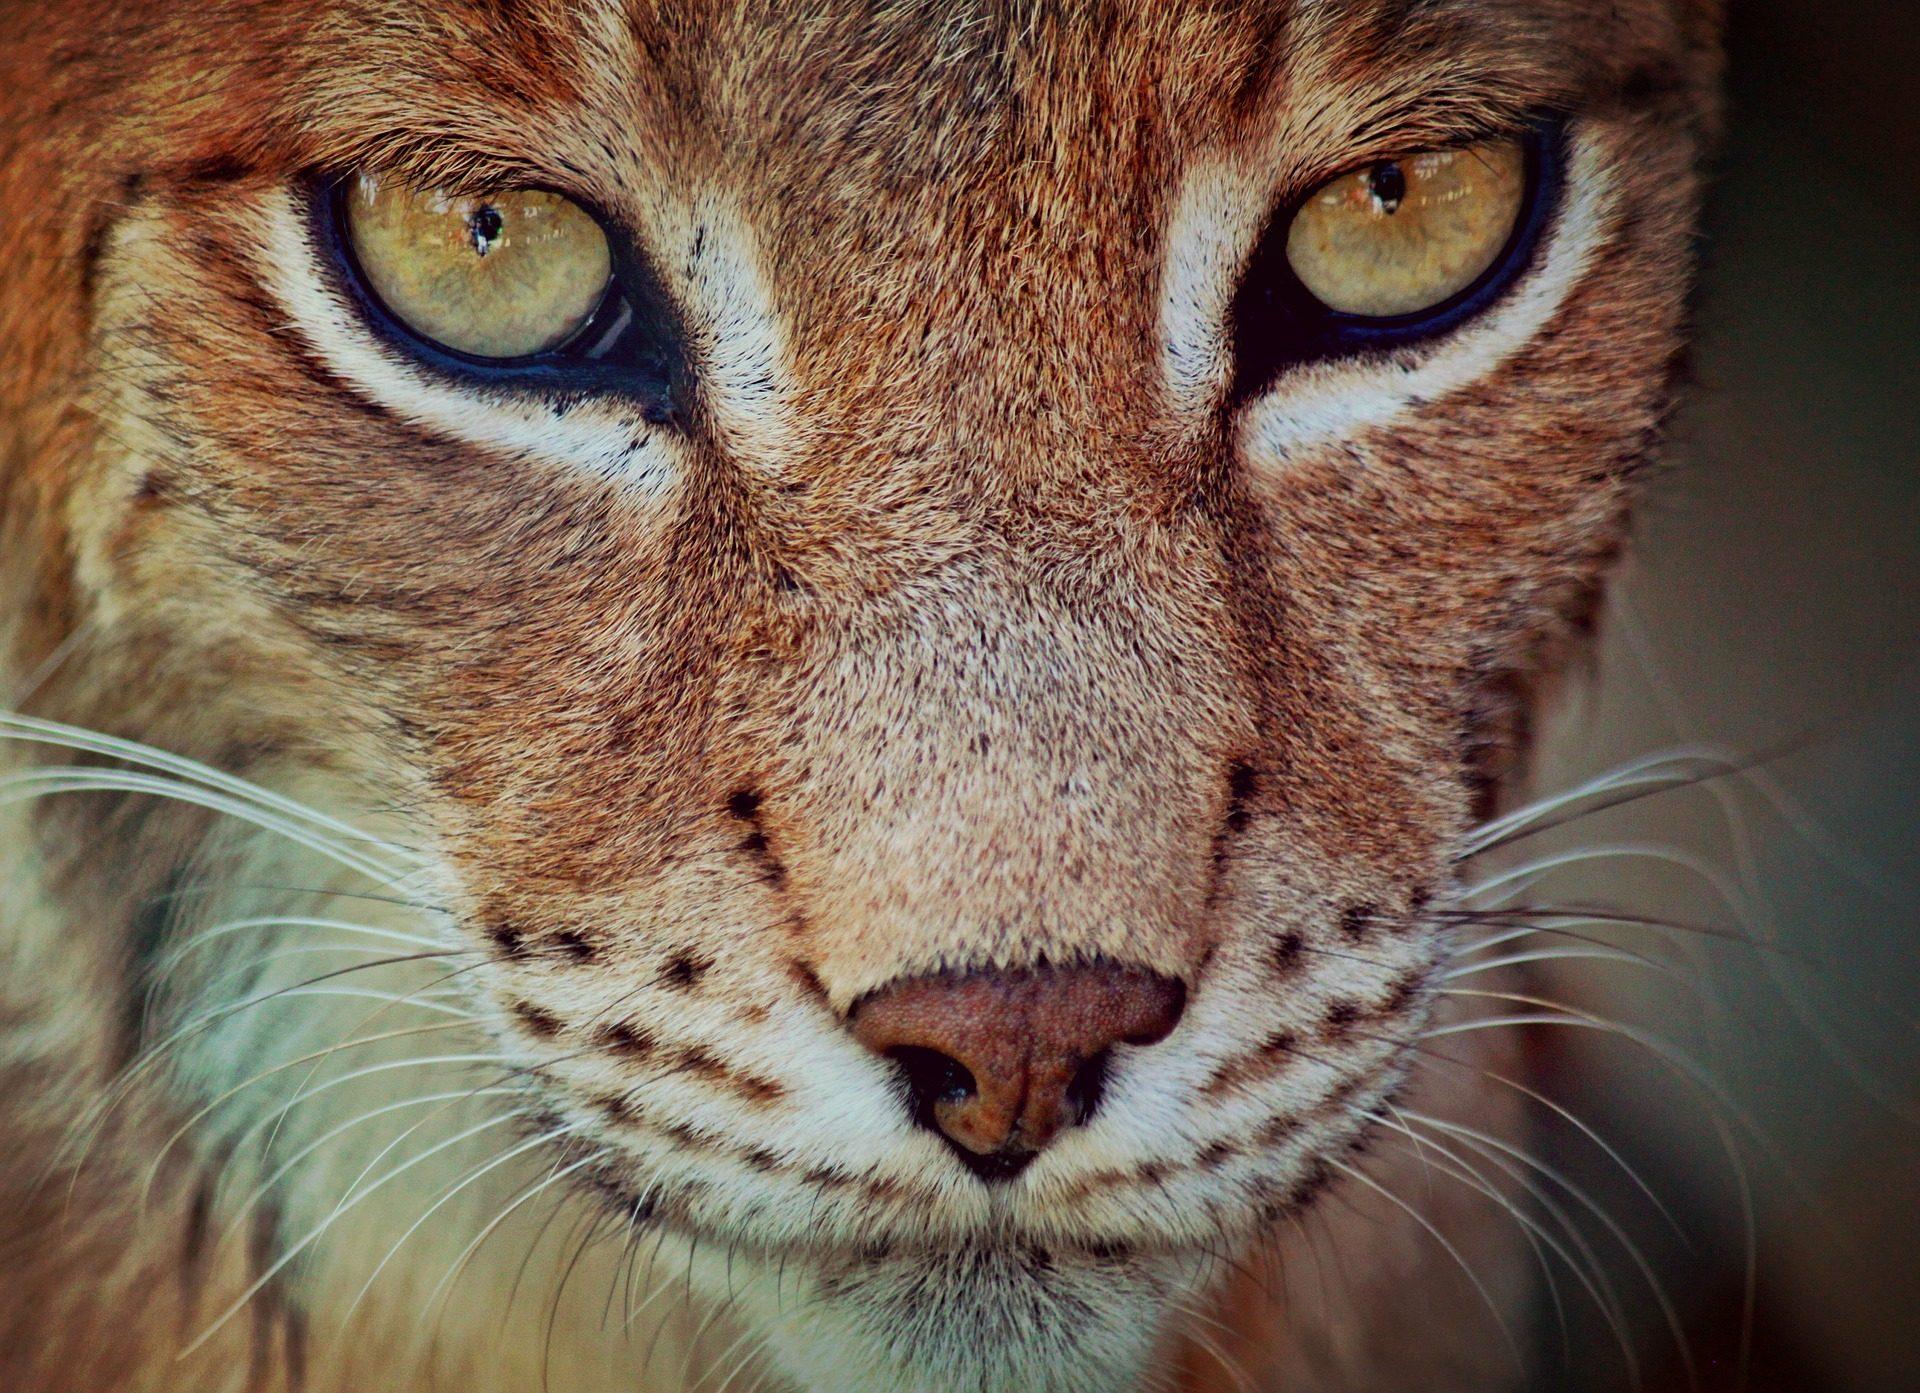 Lynx, プレデター, ネコ科の動物, 外観, ひげ, 鼻 - HD の壁紙 - 教授-falken.com